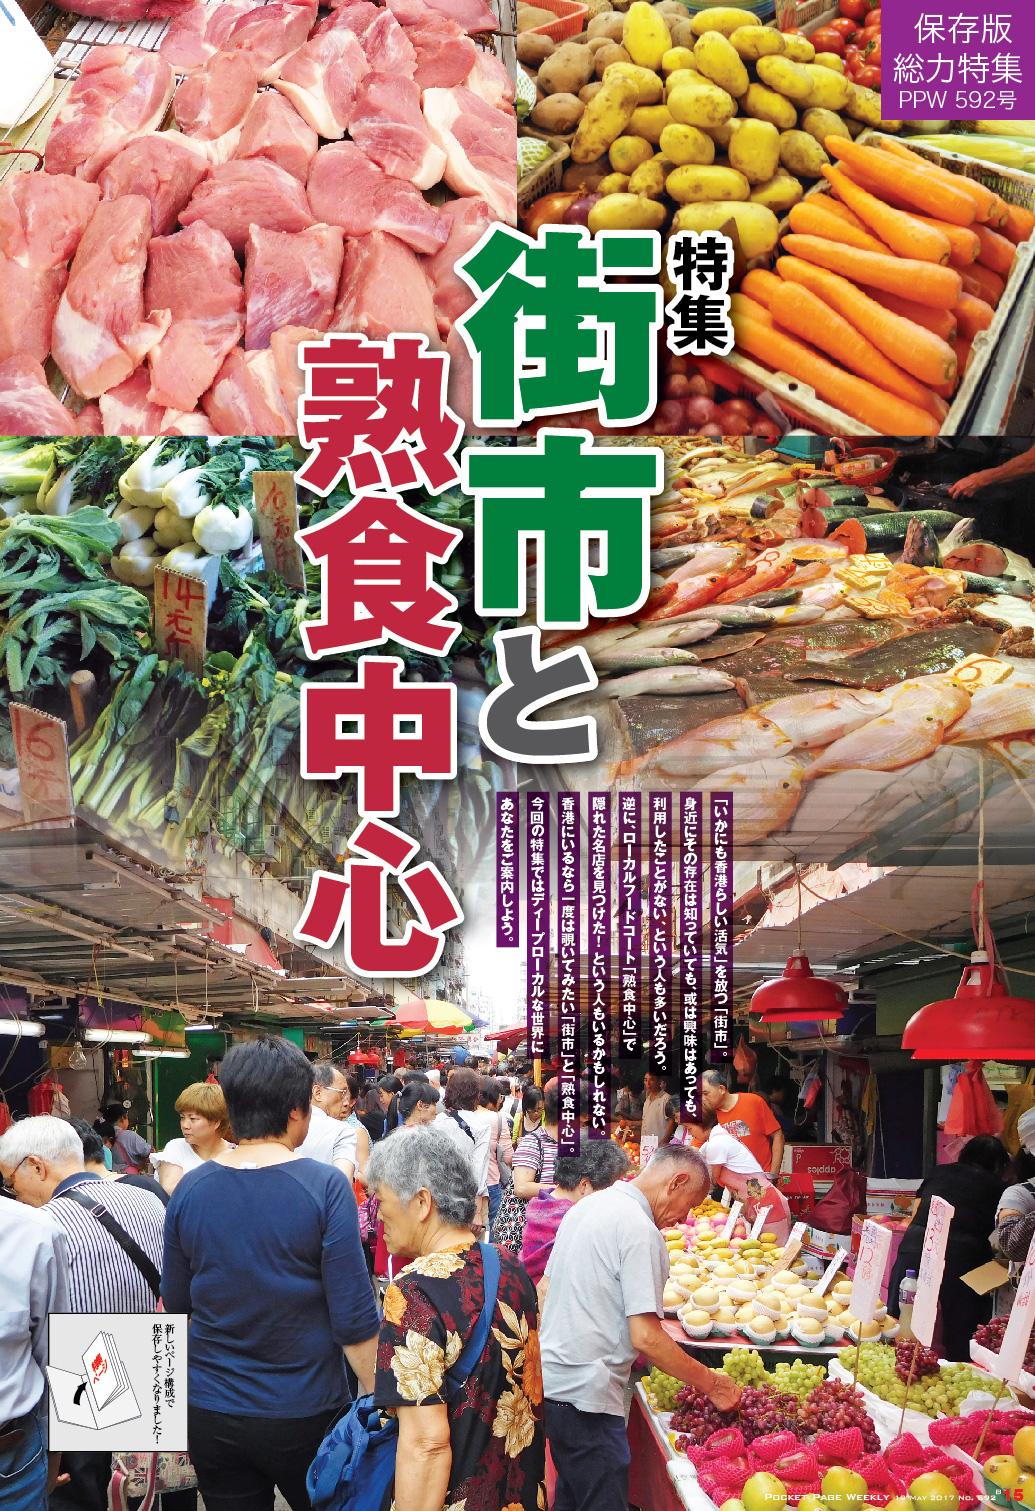 P15 Market 592-01